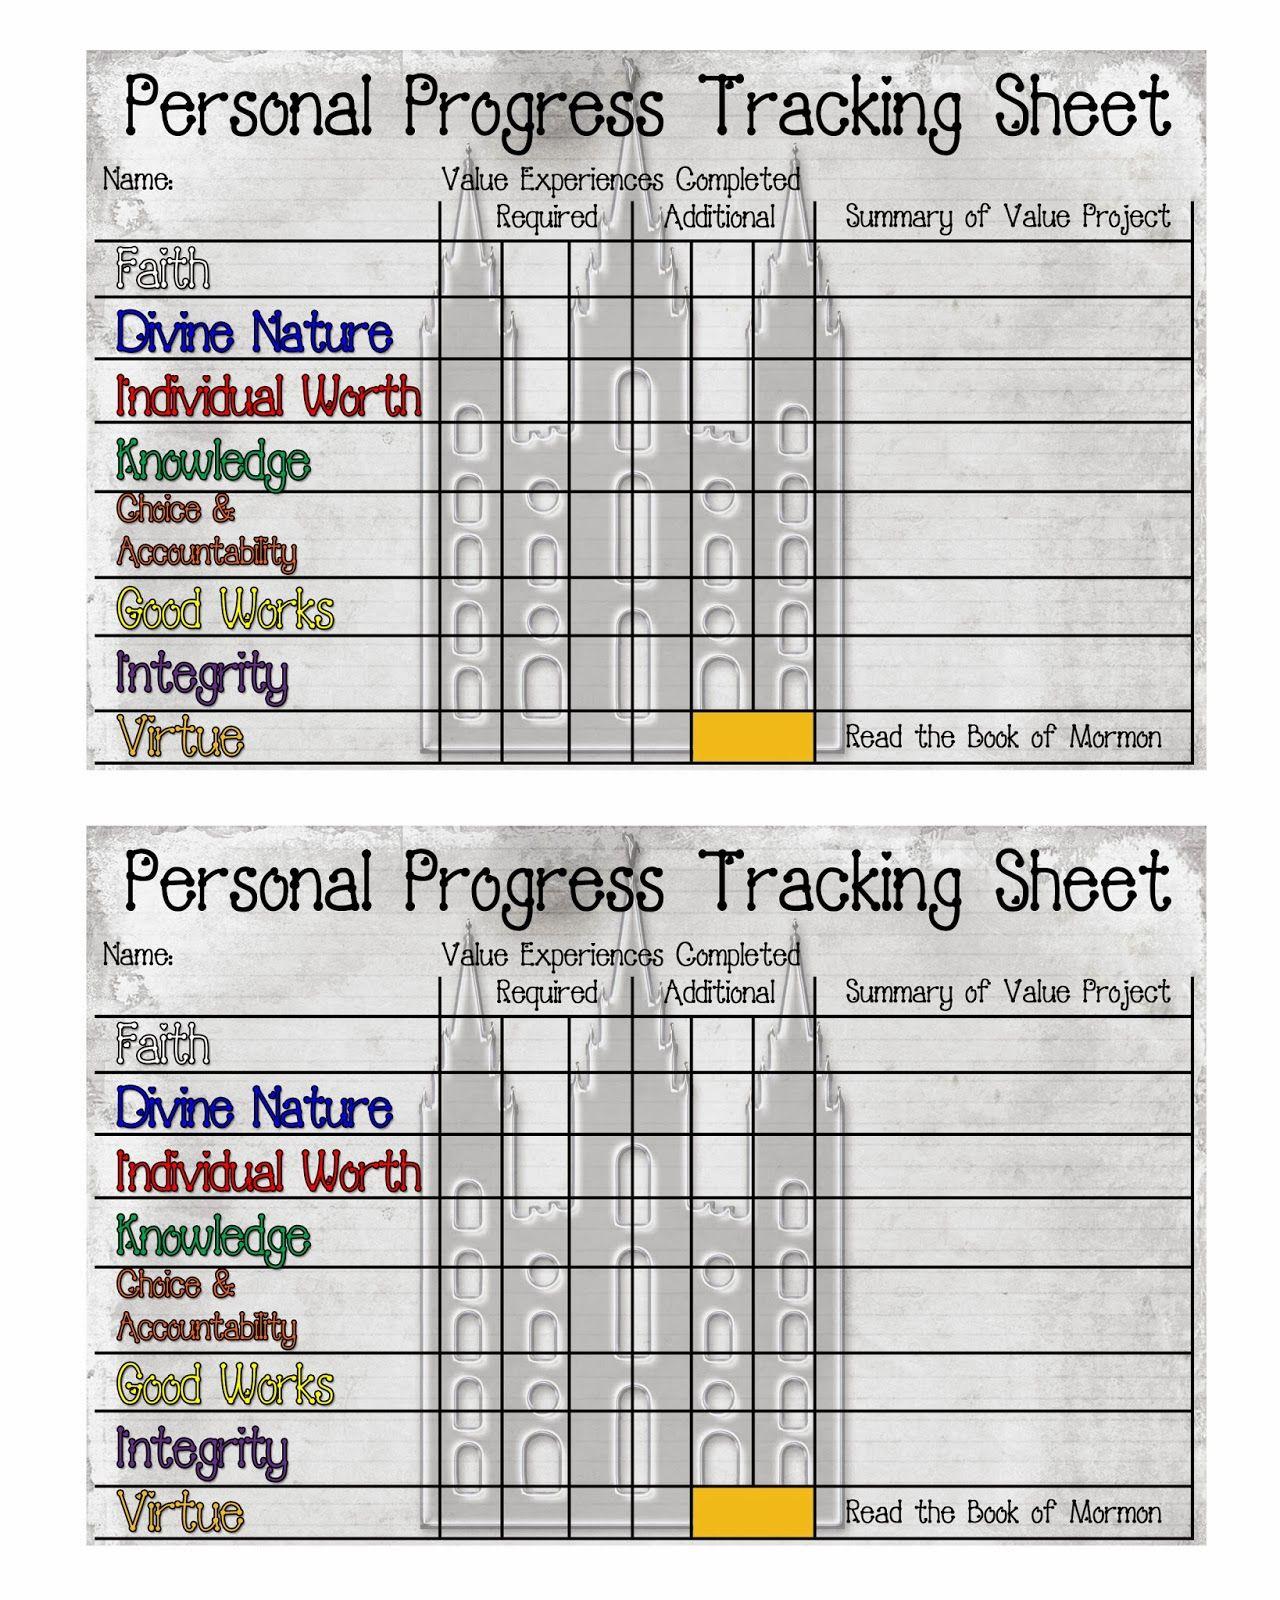 Personal Progress Tracking Sheet Free Printable